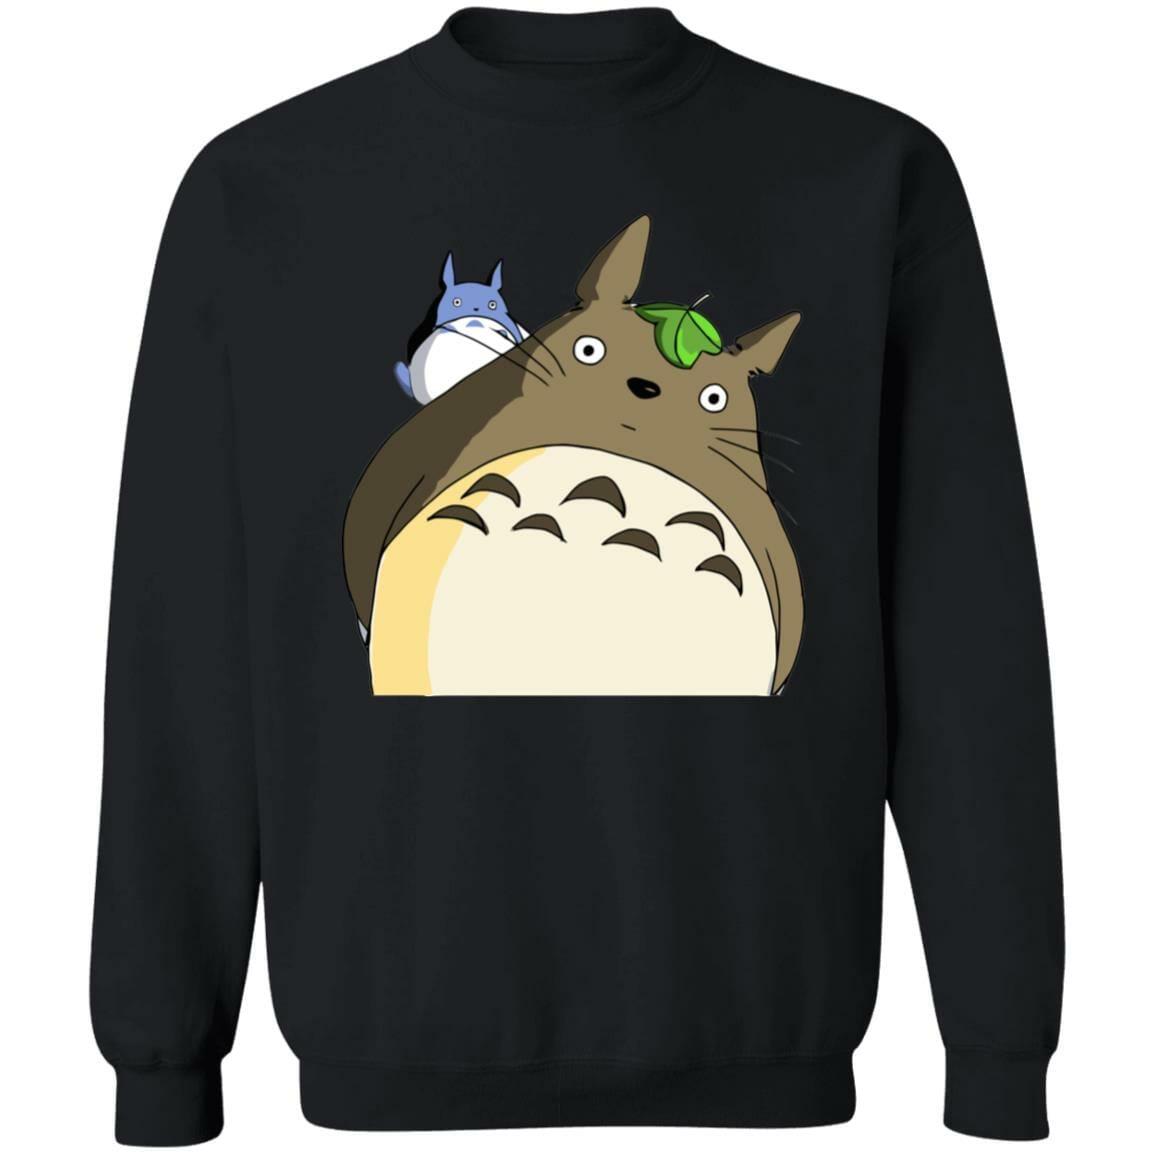 The Curious Totoro Sweatshirt